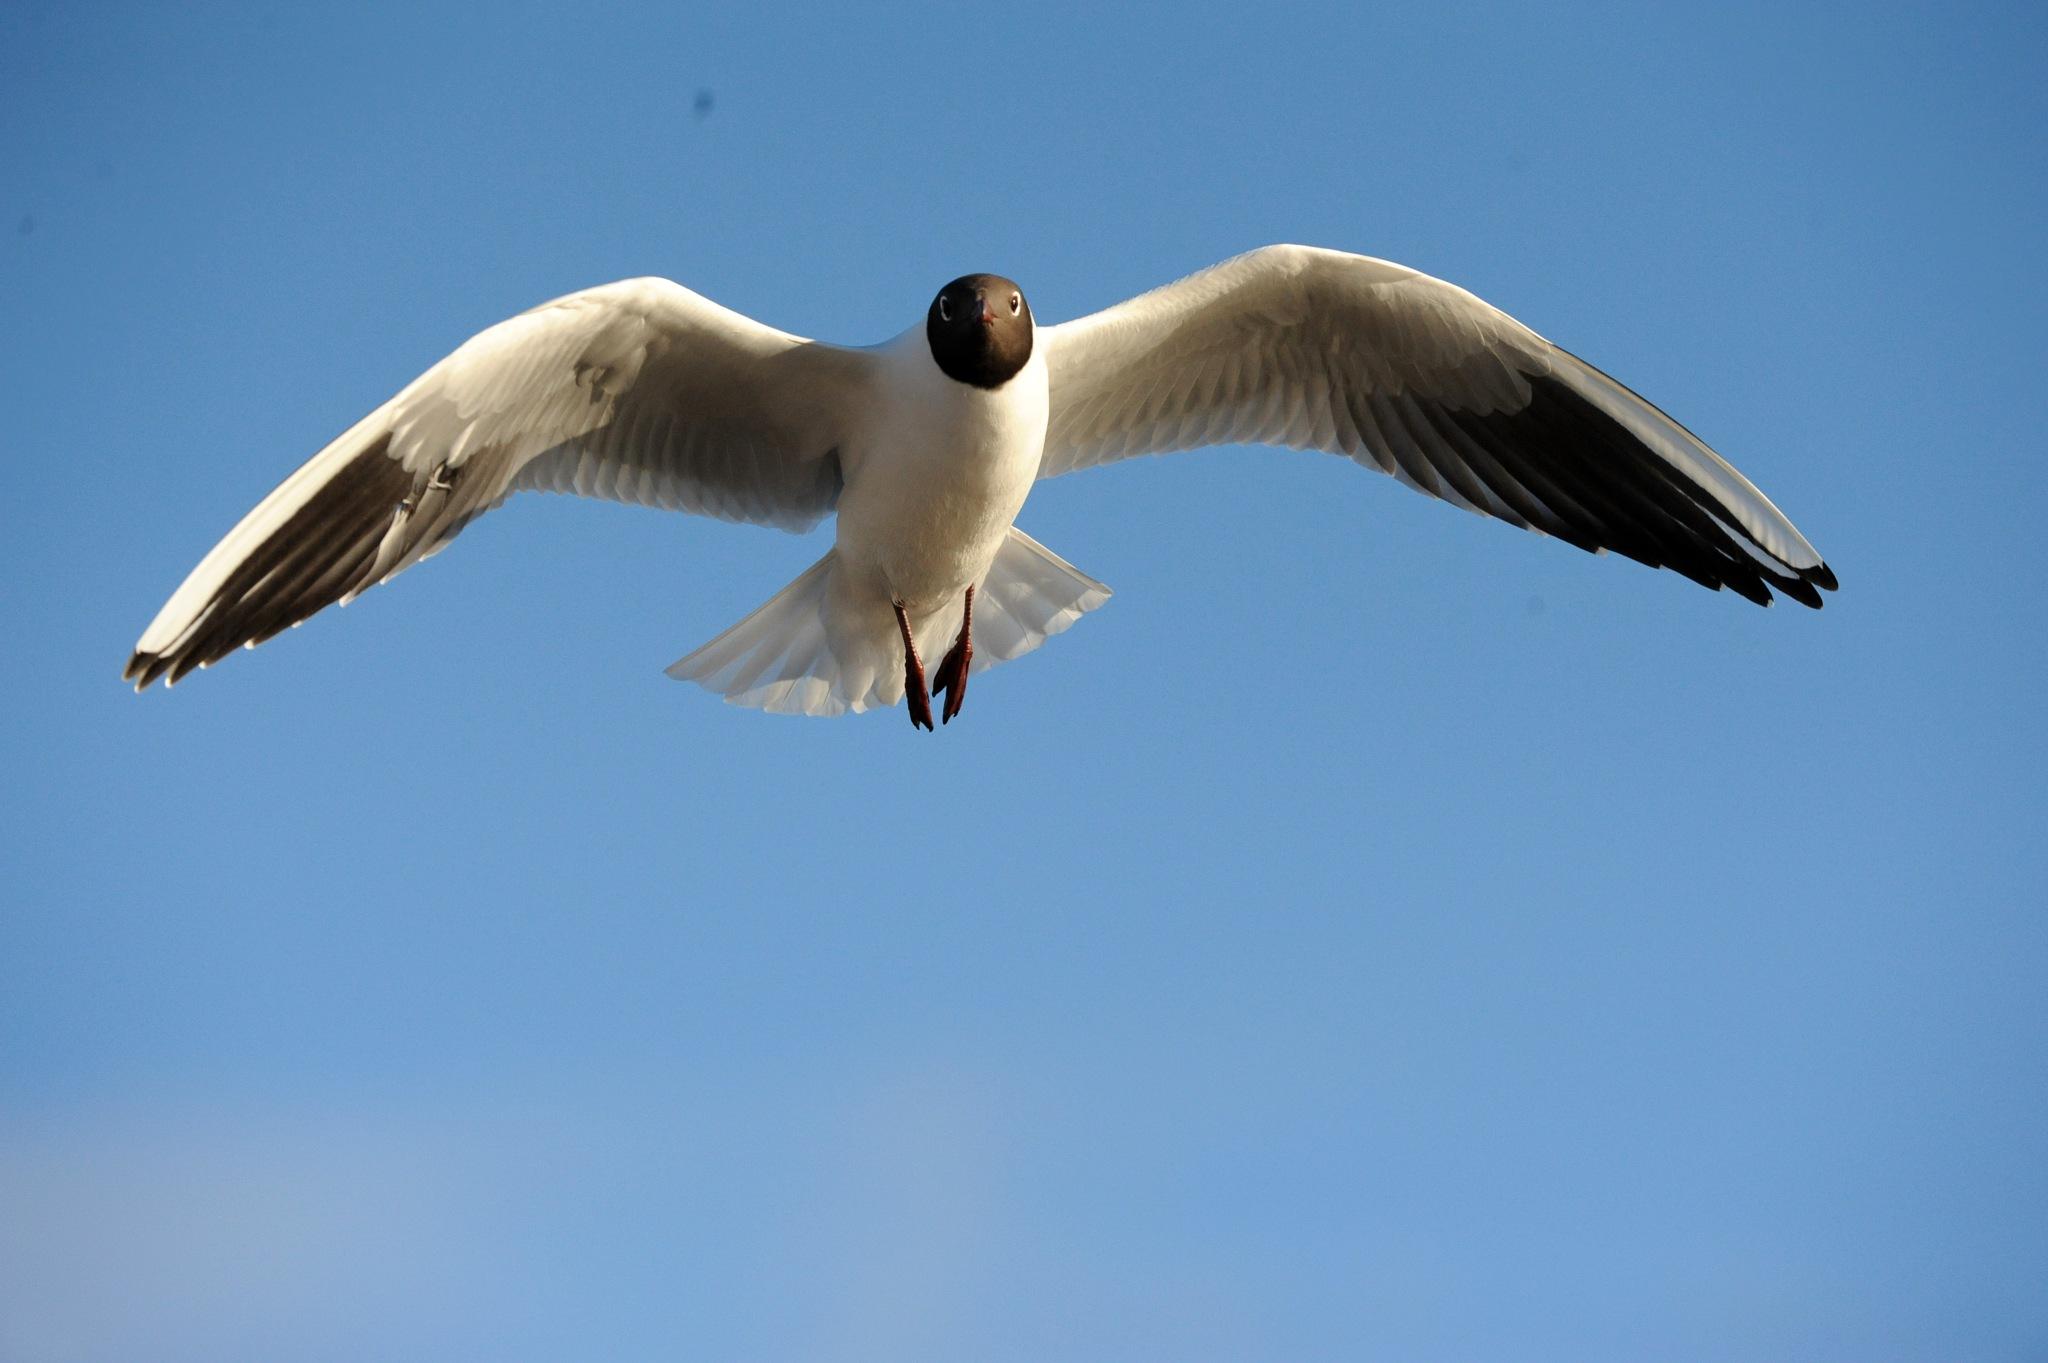 Fugl - bird by Lasse Tur